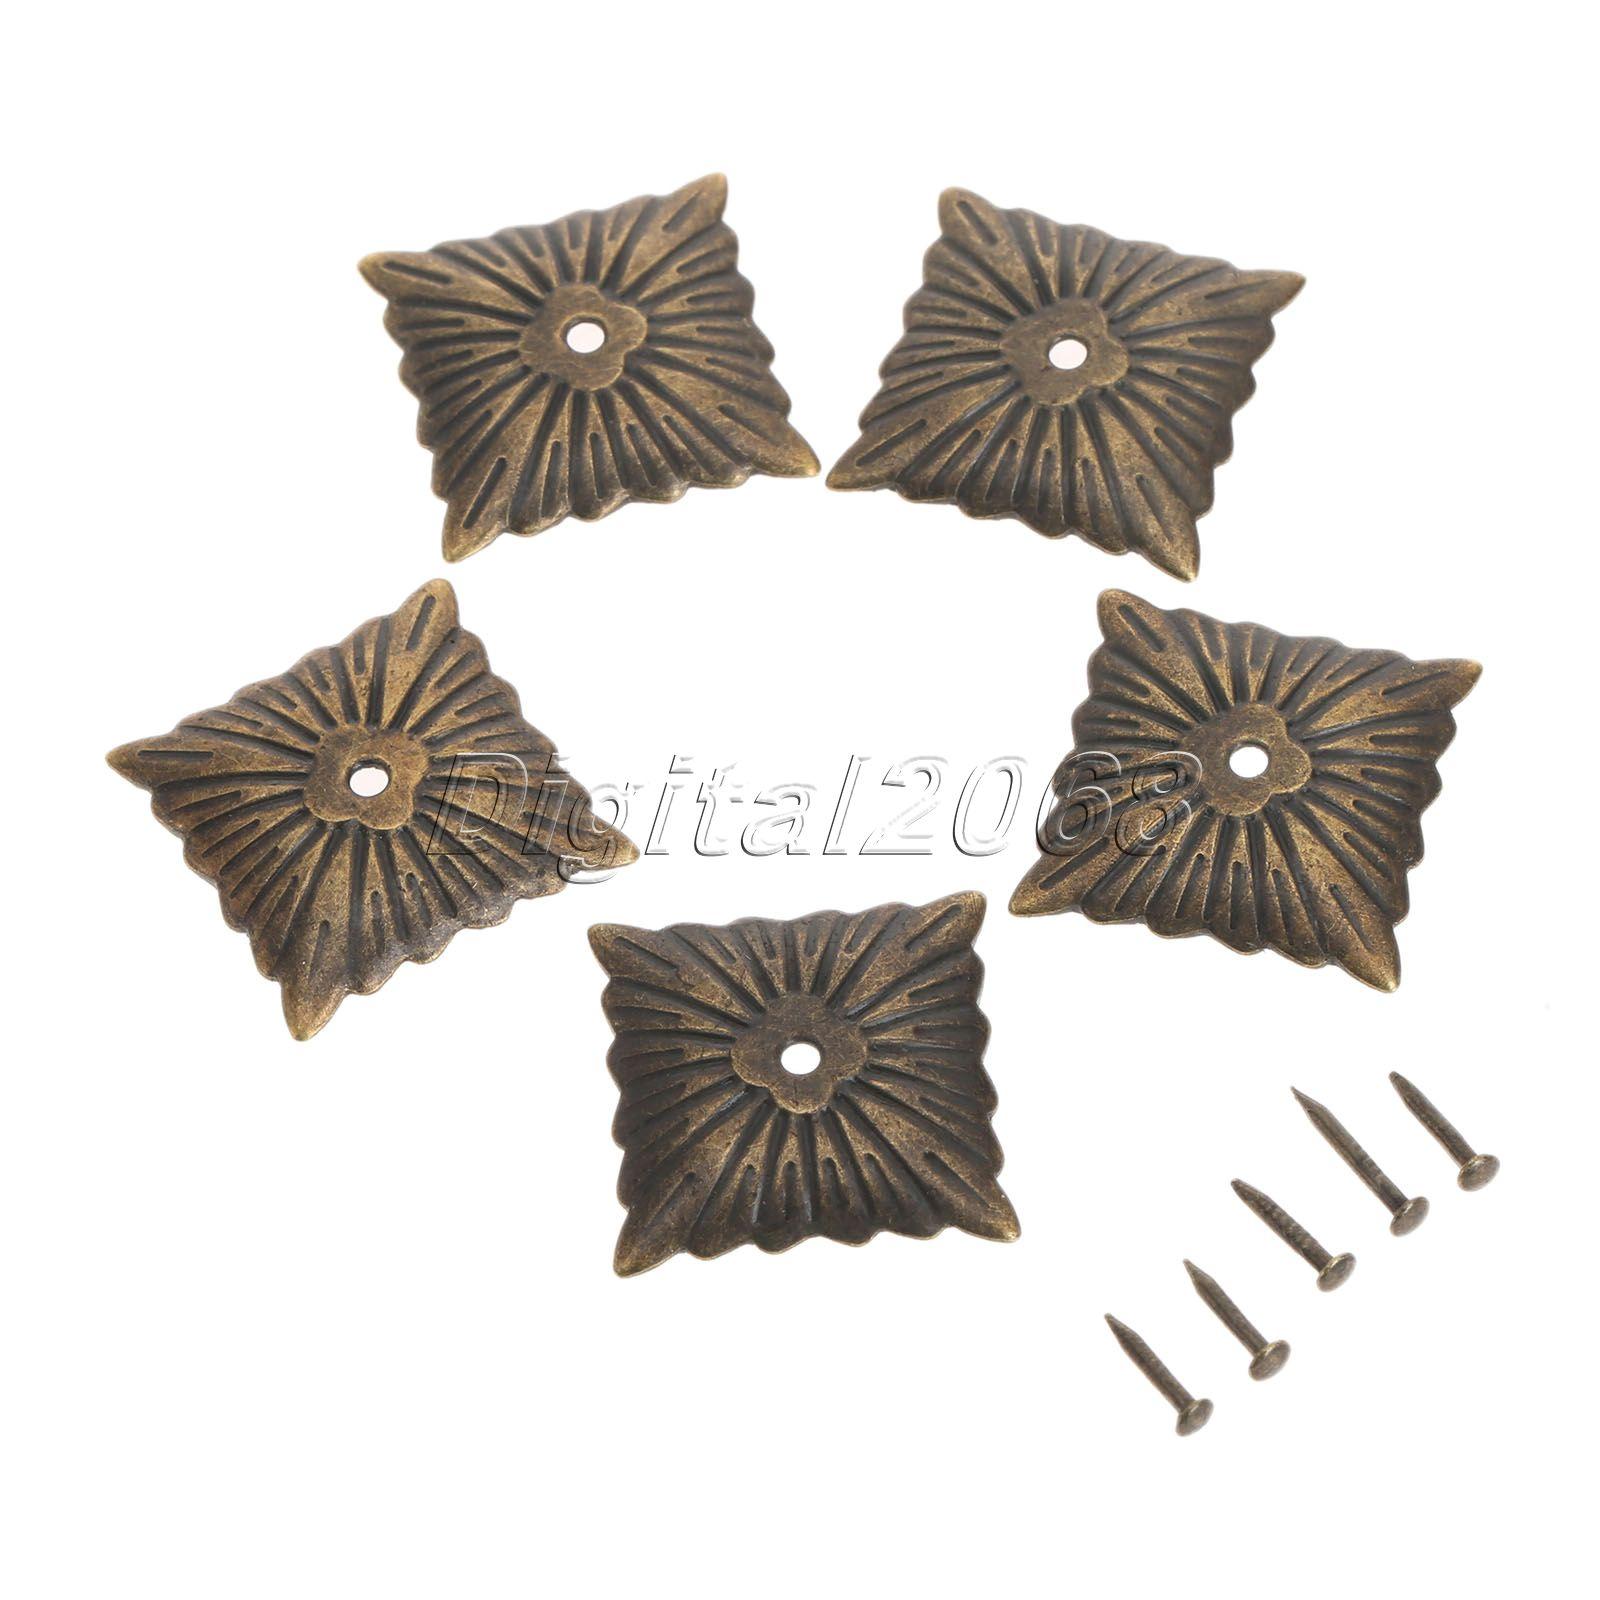 ⑤100Pcs Iron Bronze Antique Square Decorative Upholstery Nails Tack ...